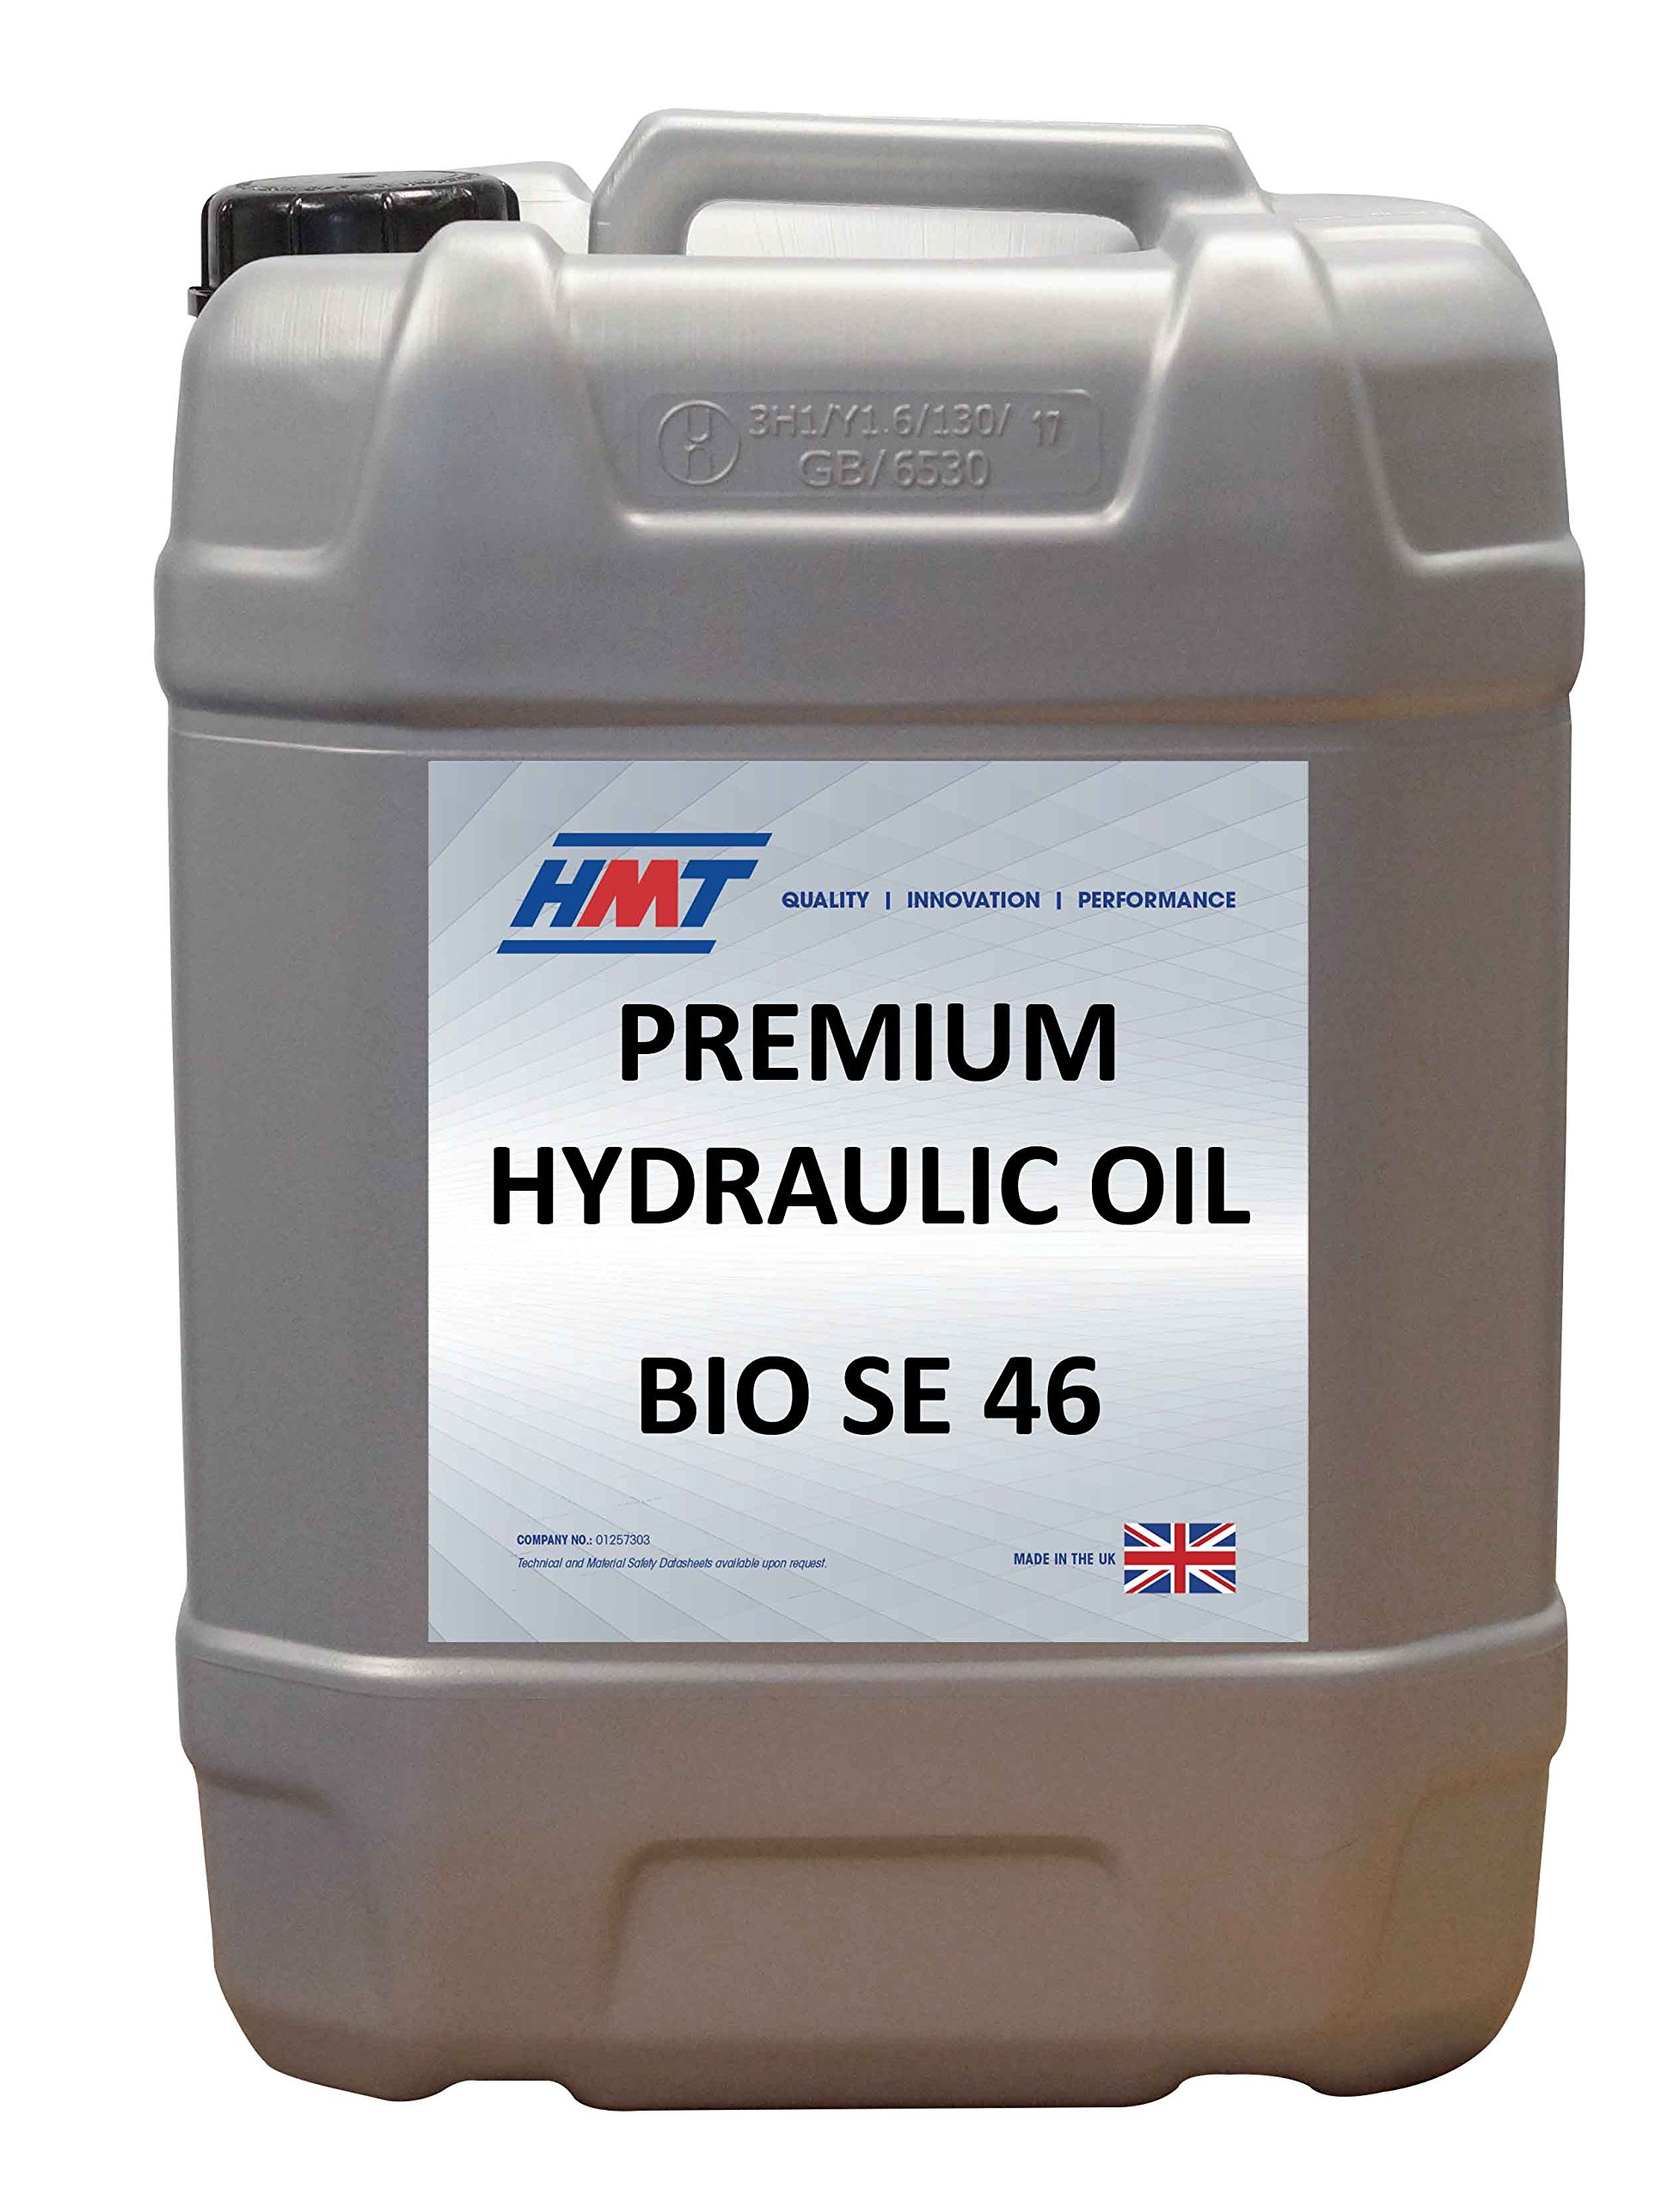 HMTH193 Premium Hydraulic Oil Biodegradable SE 46 - 20 Litre Plastic by HMT